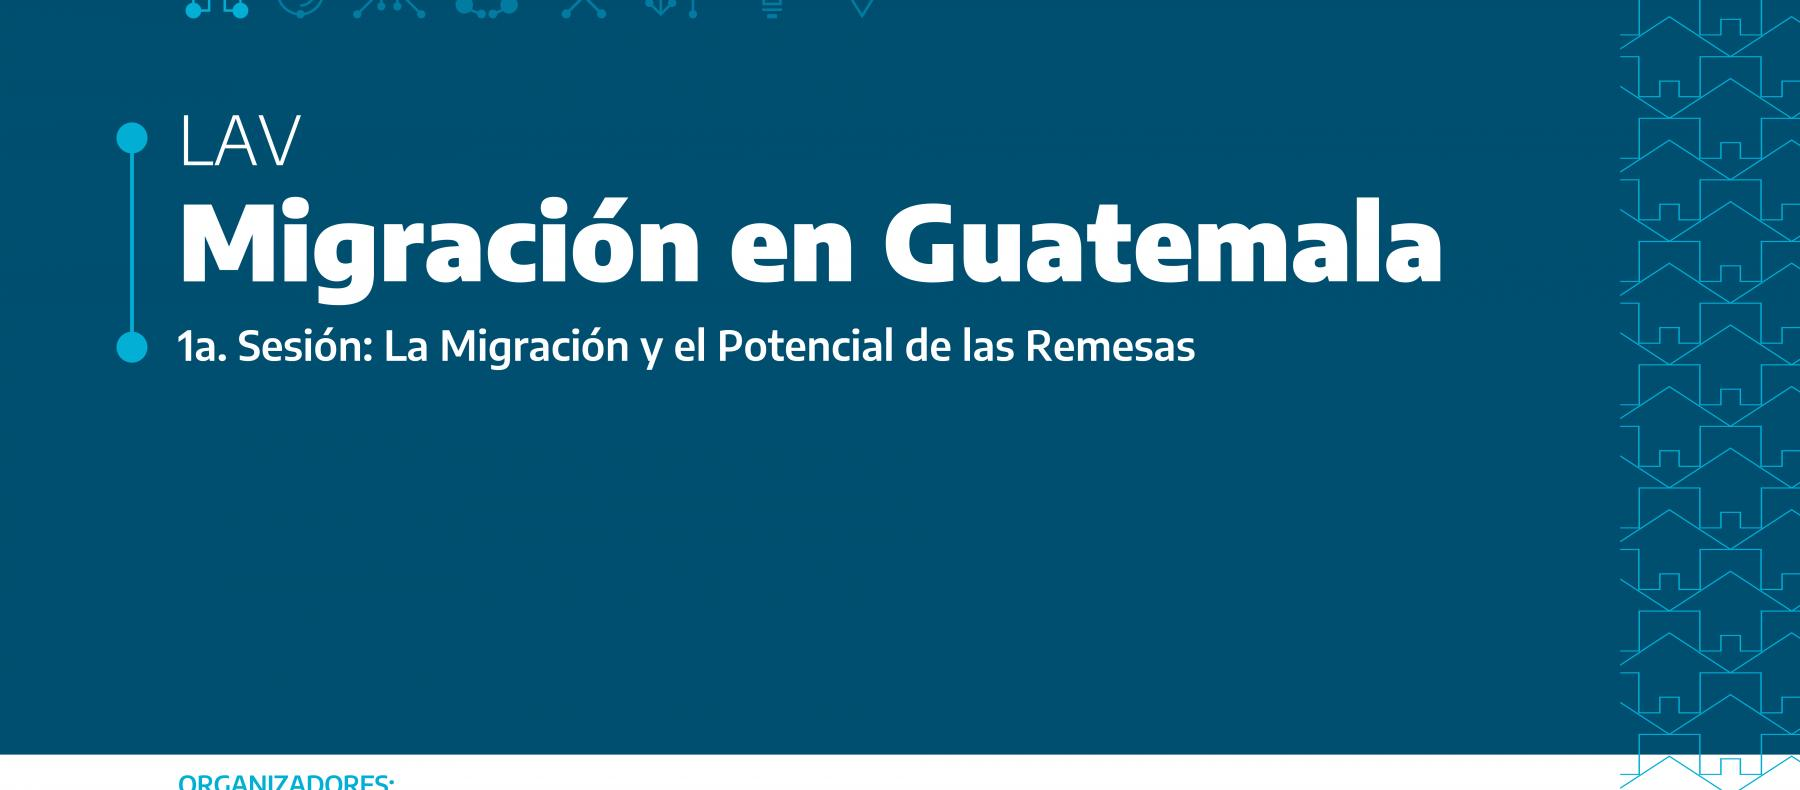 lav-migracion-guatemala-youtube